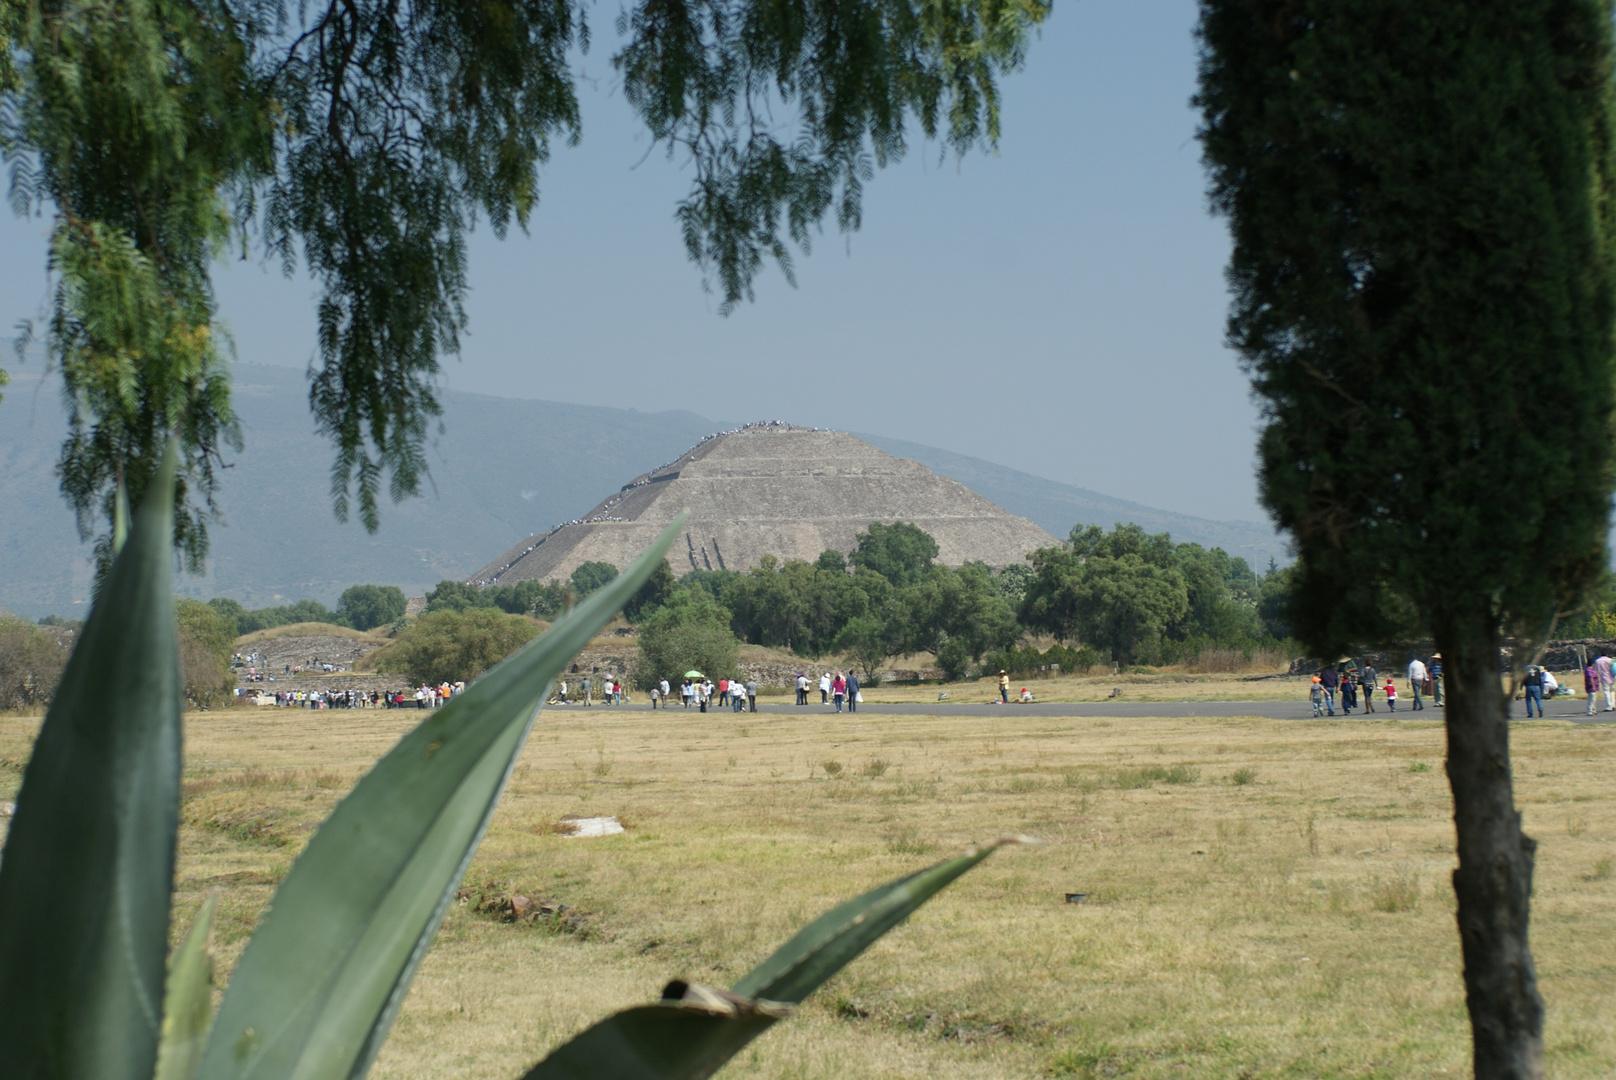 Pyramide der Sonne, Teotihuacán - México